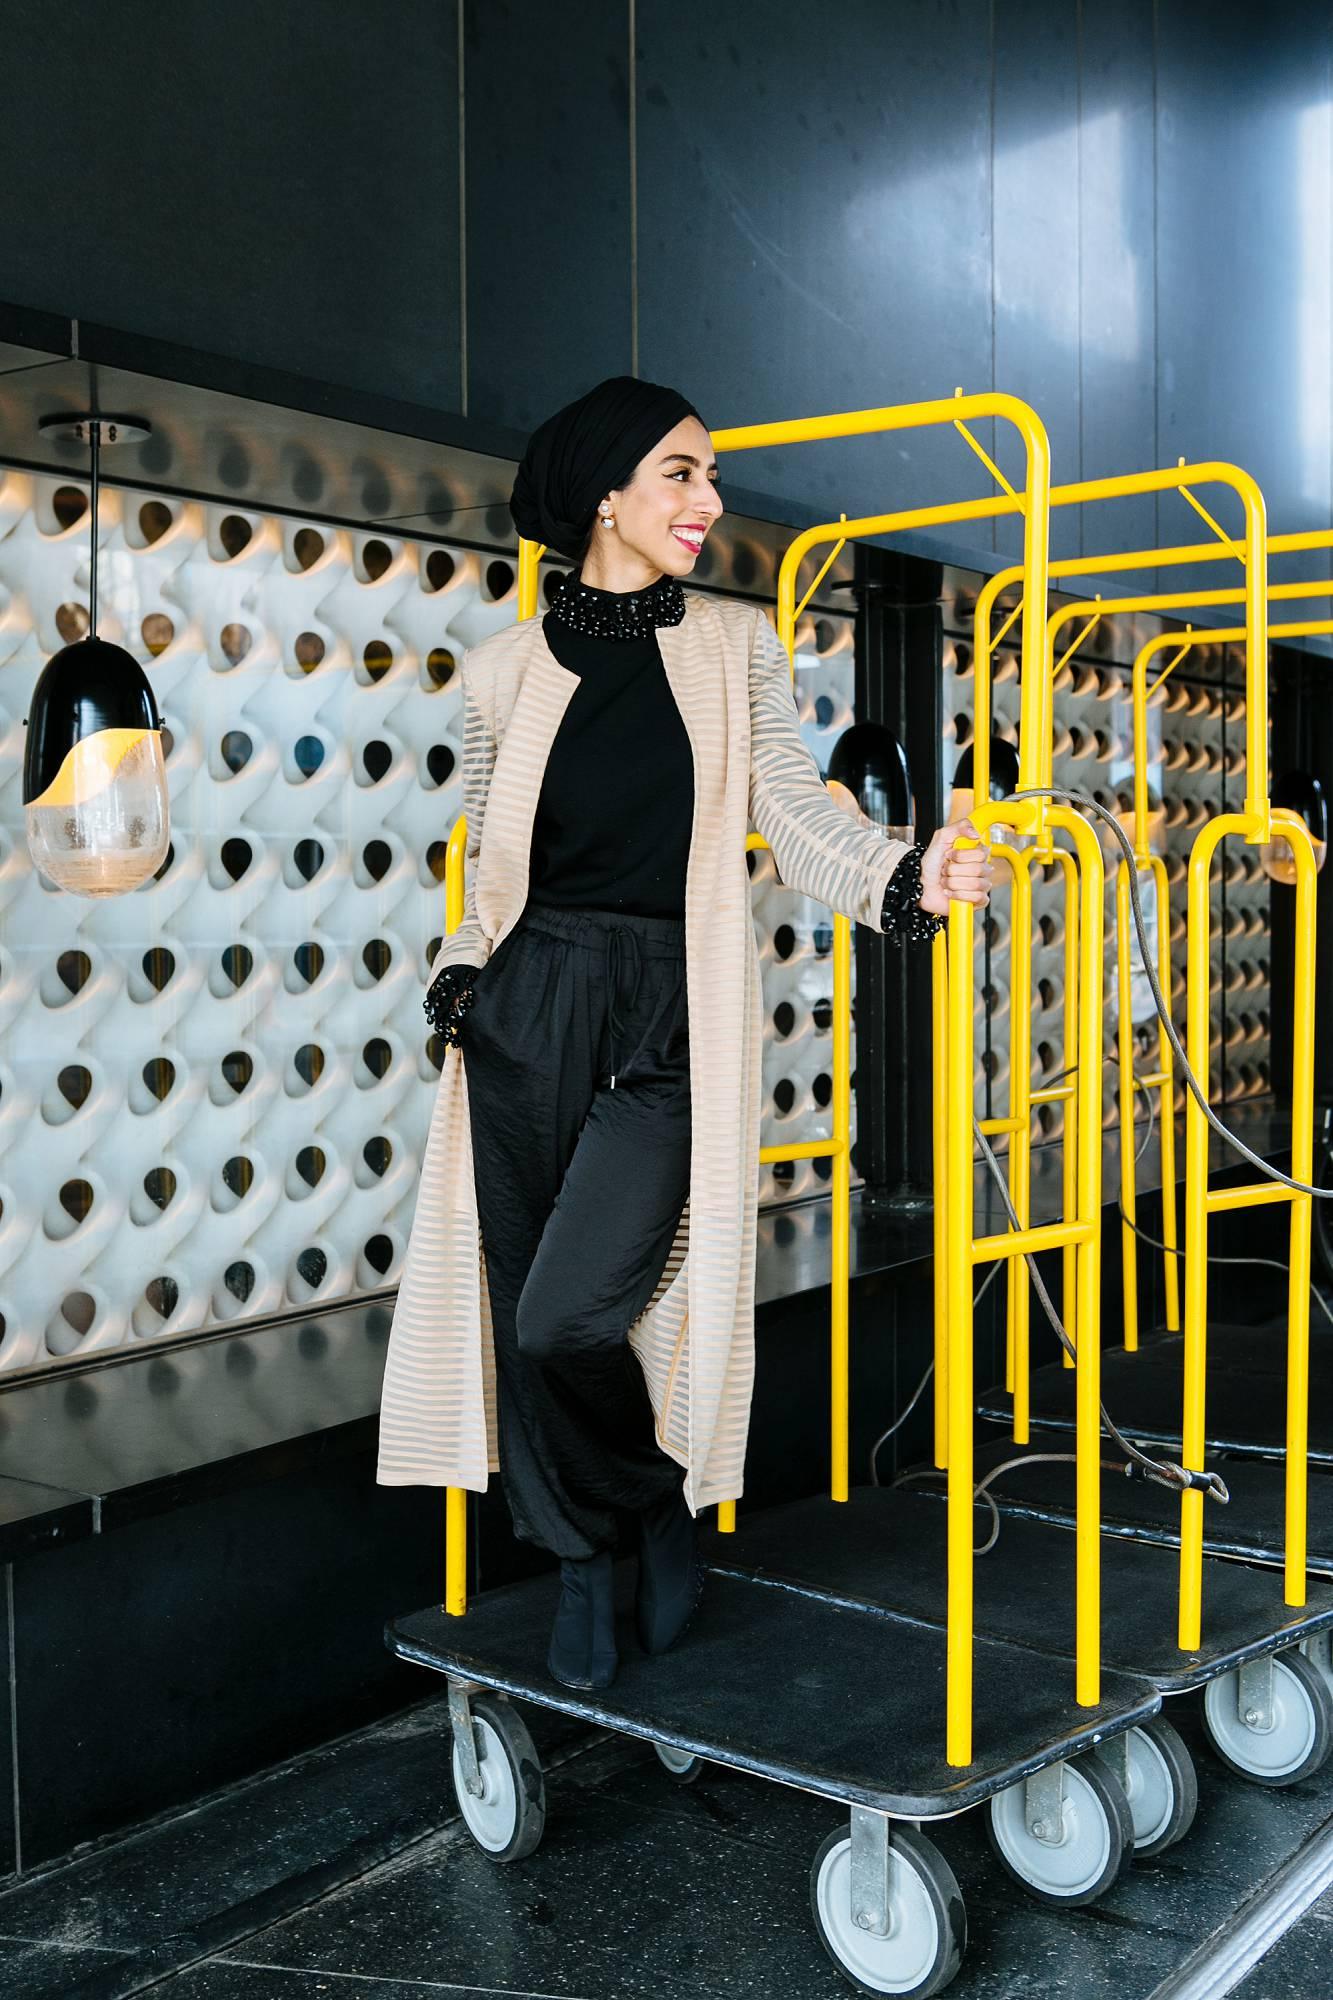 Modest fashion NYC photographer